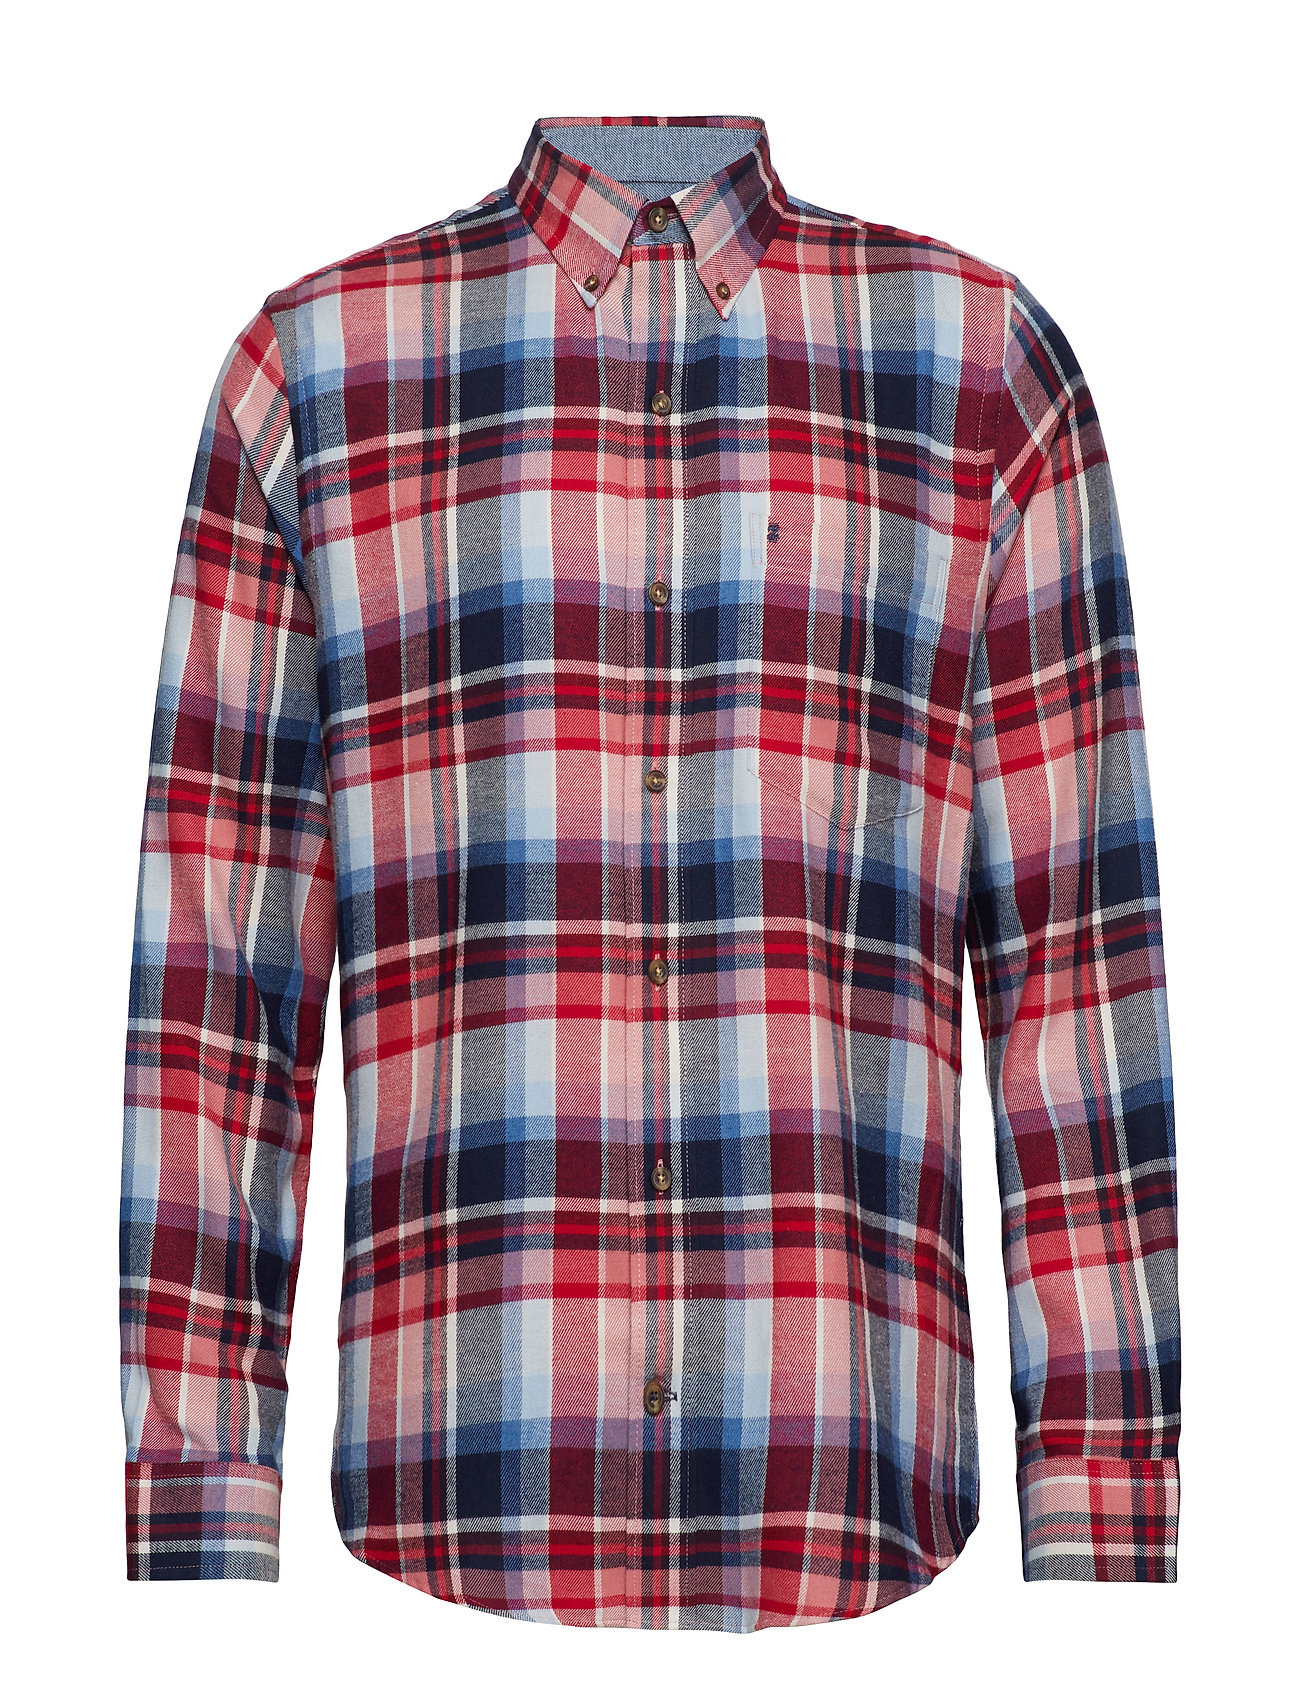 Flannel Flannel Shirtreal Plaid Shirtreal Bd Flannel RedIzod Bd RedIzod Plaid nvN0wOym8